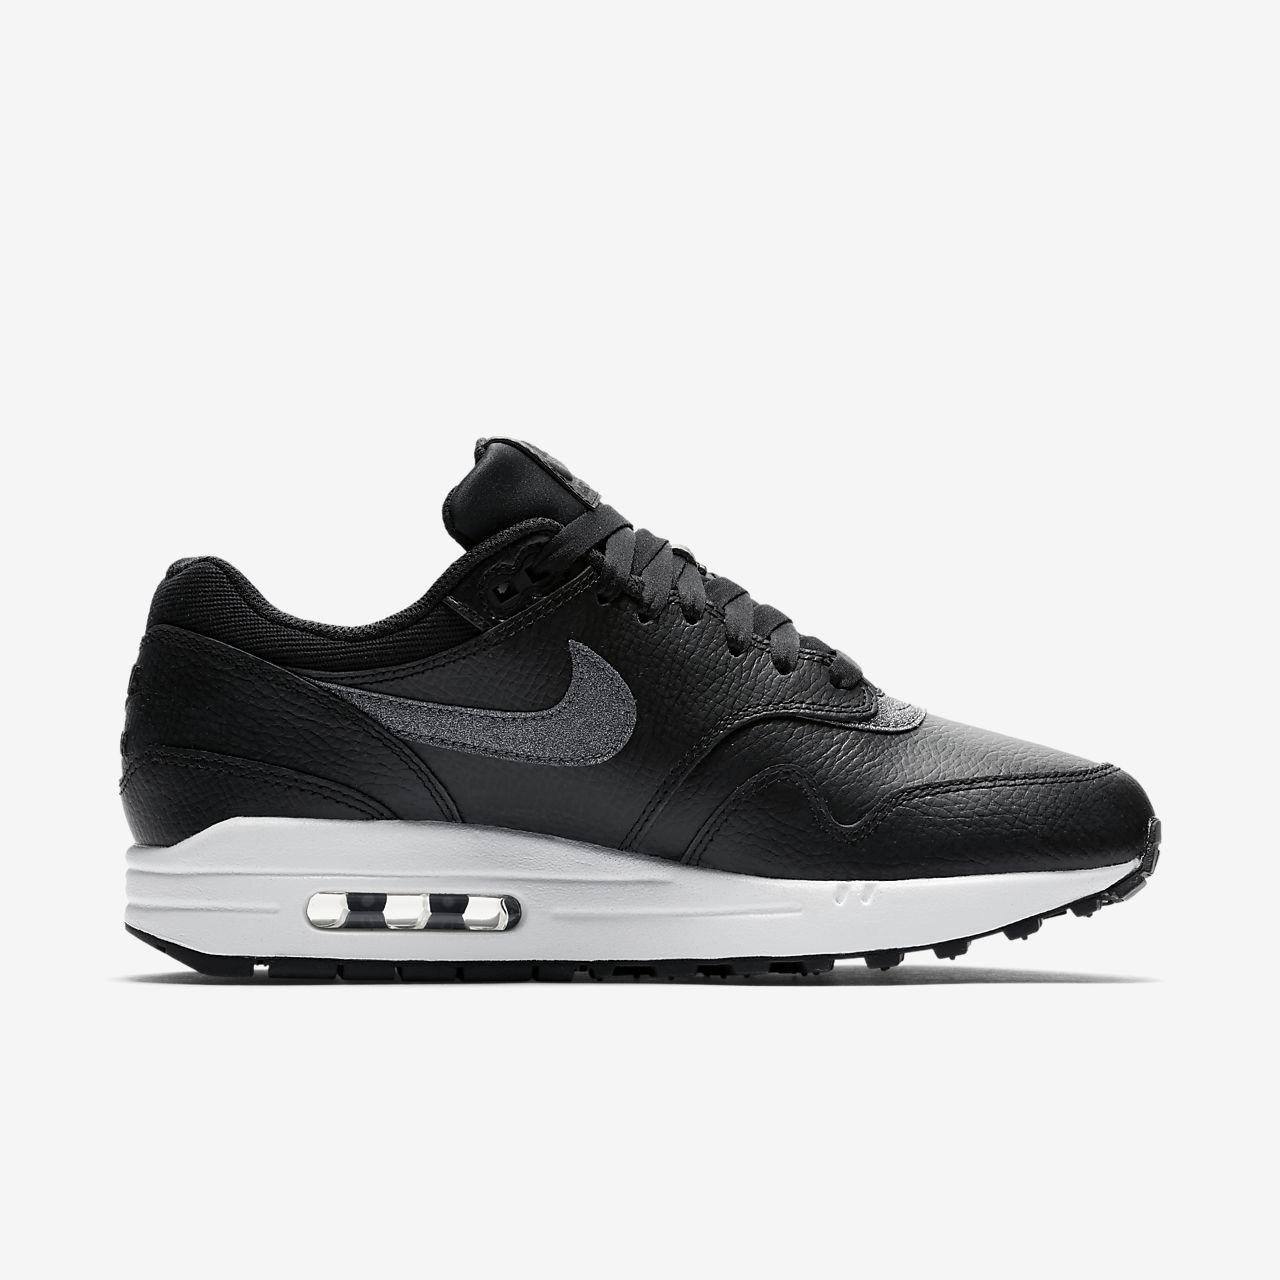 low priced d4dd3 8f791 ... Nike Air Max 1 SE Glitter Women s Shoe